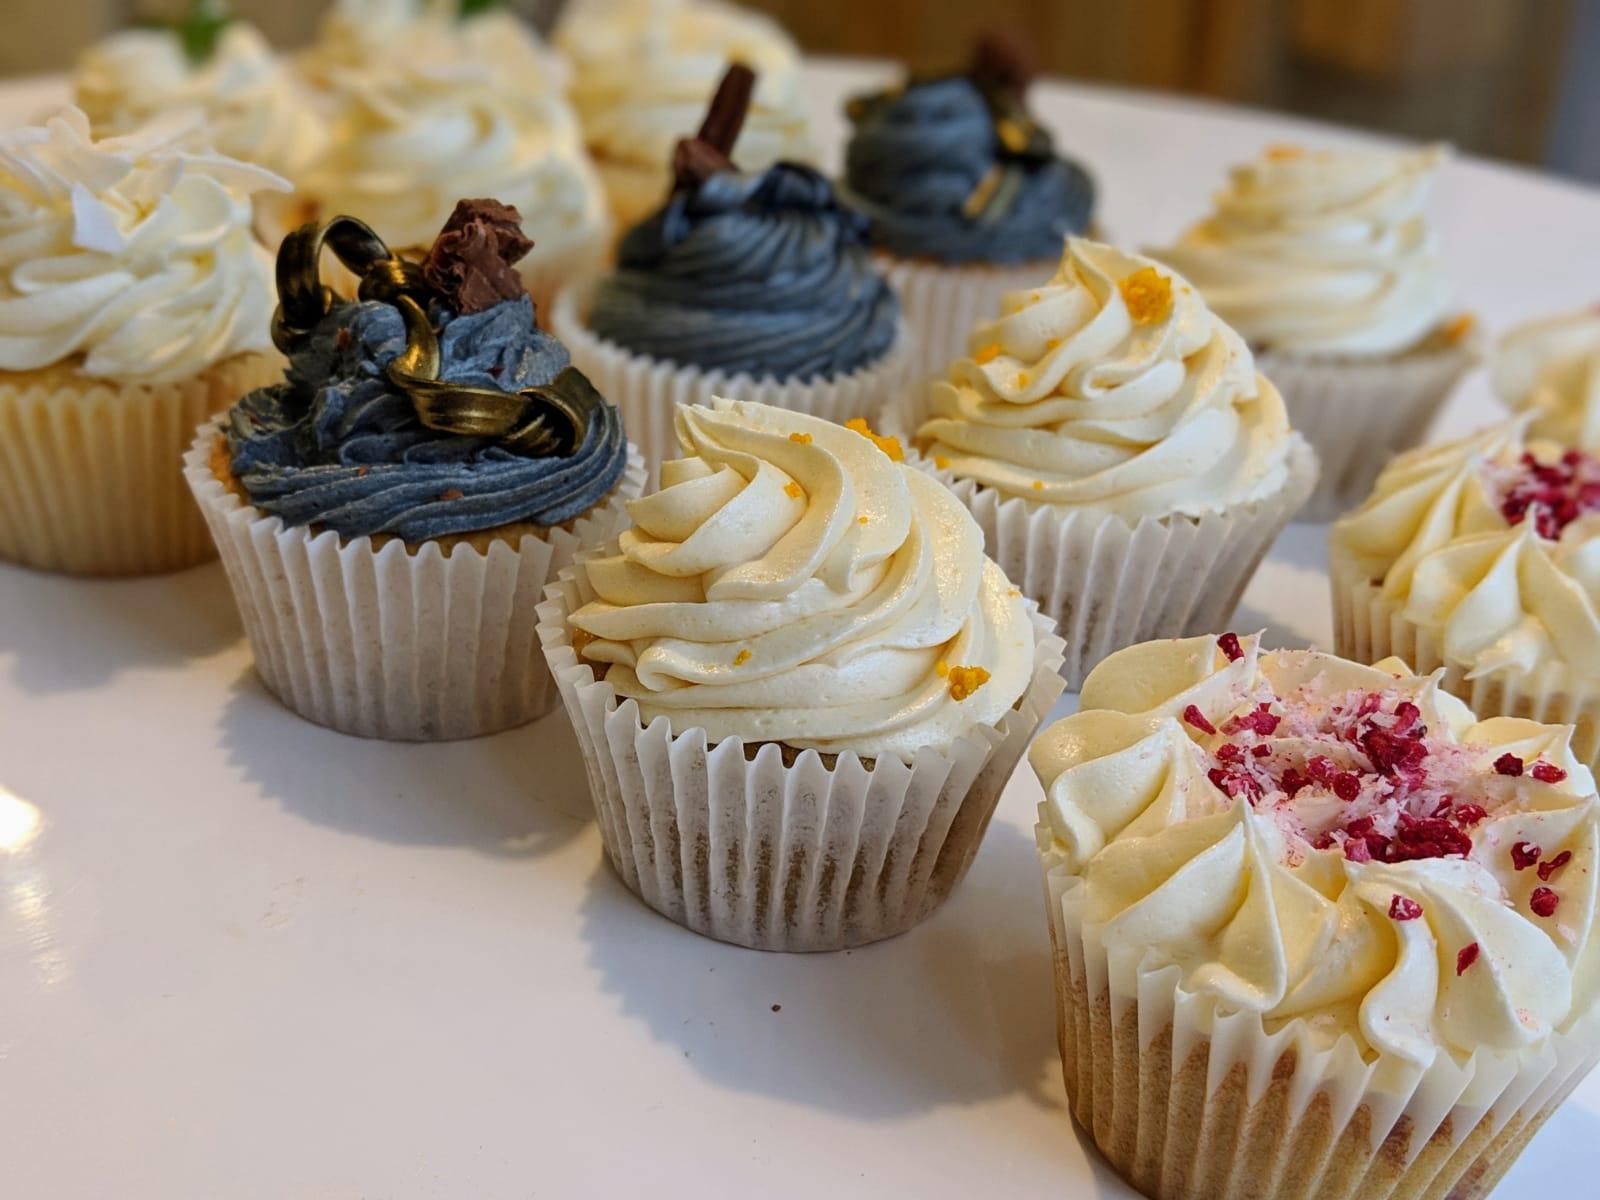 cupcakes2.jpg